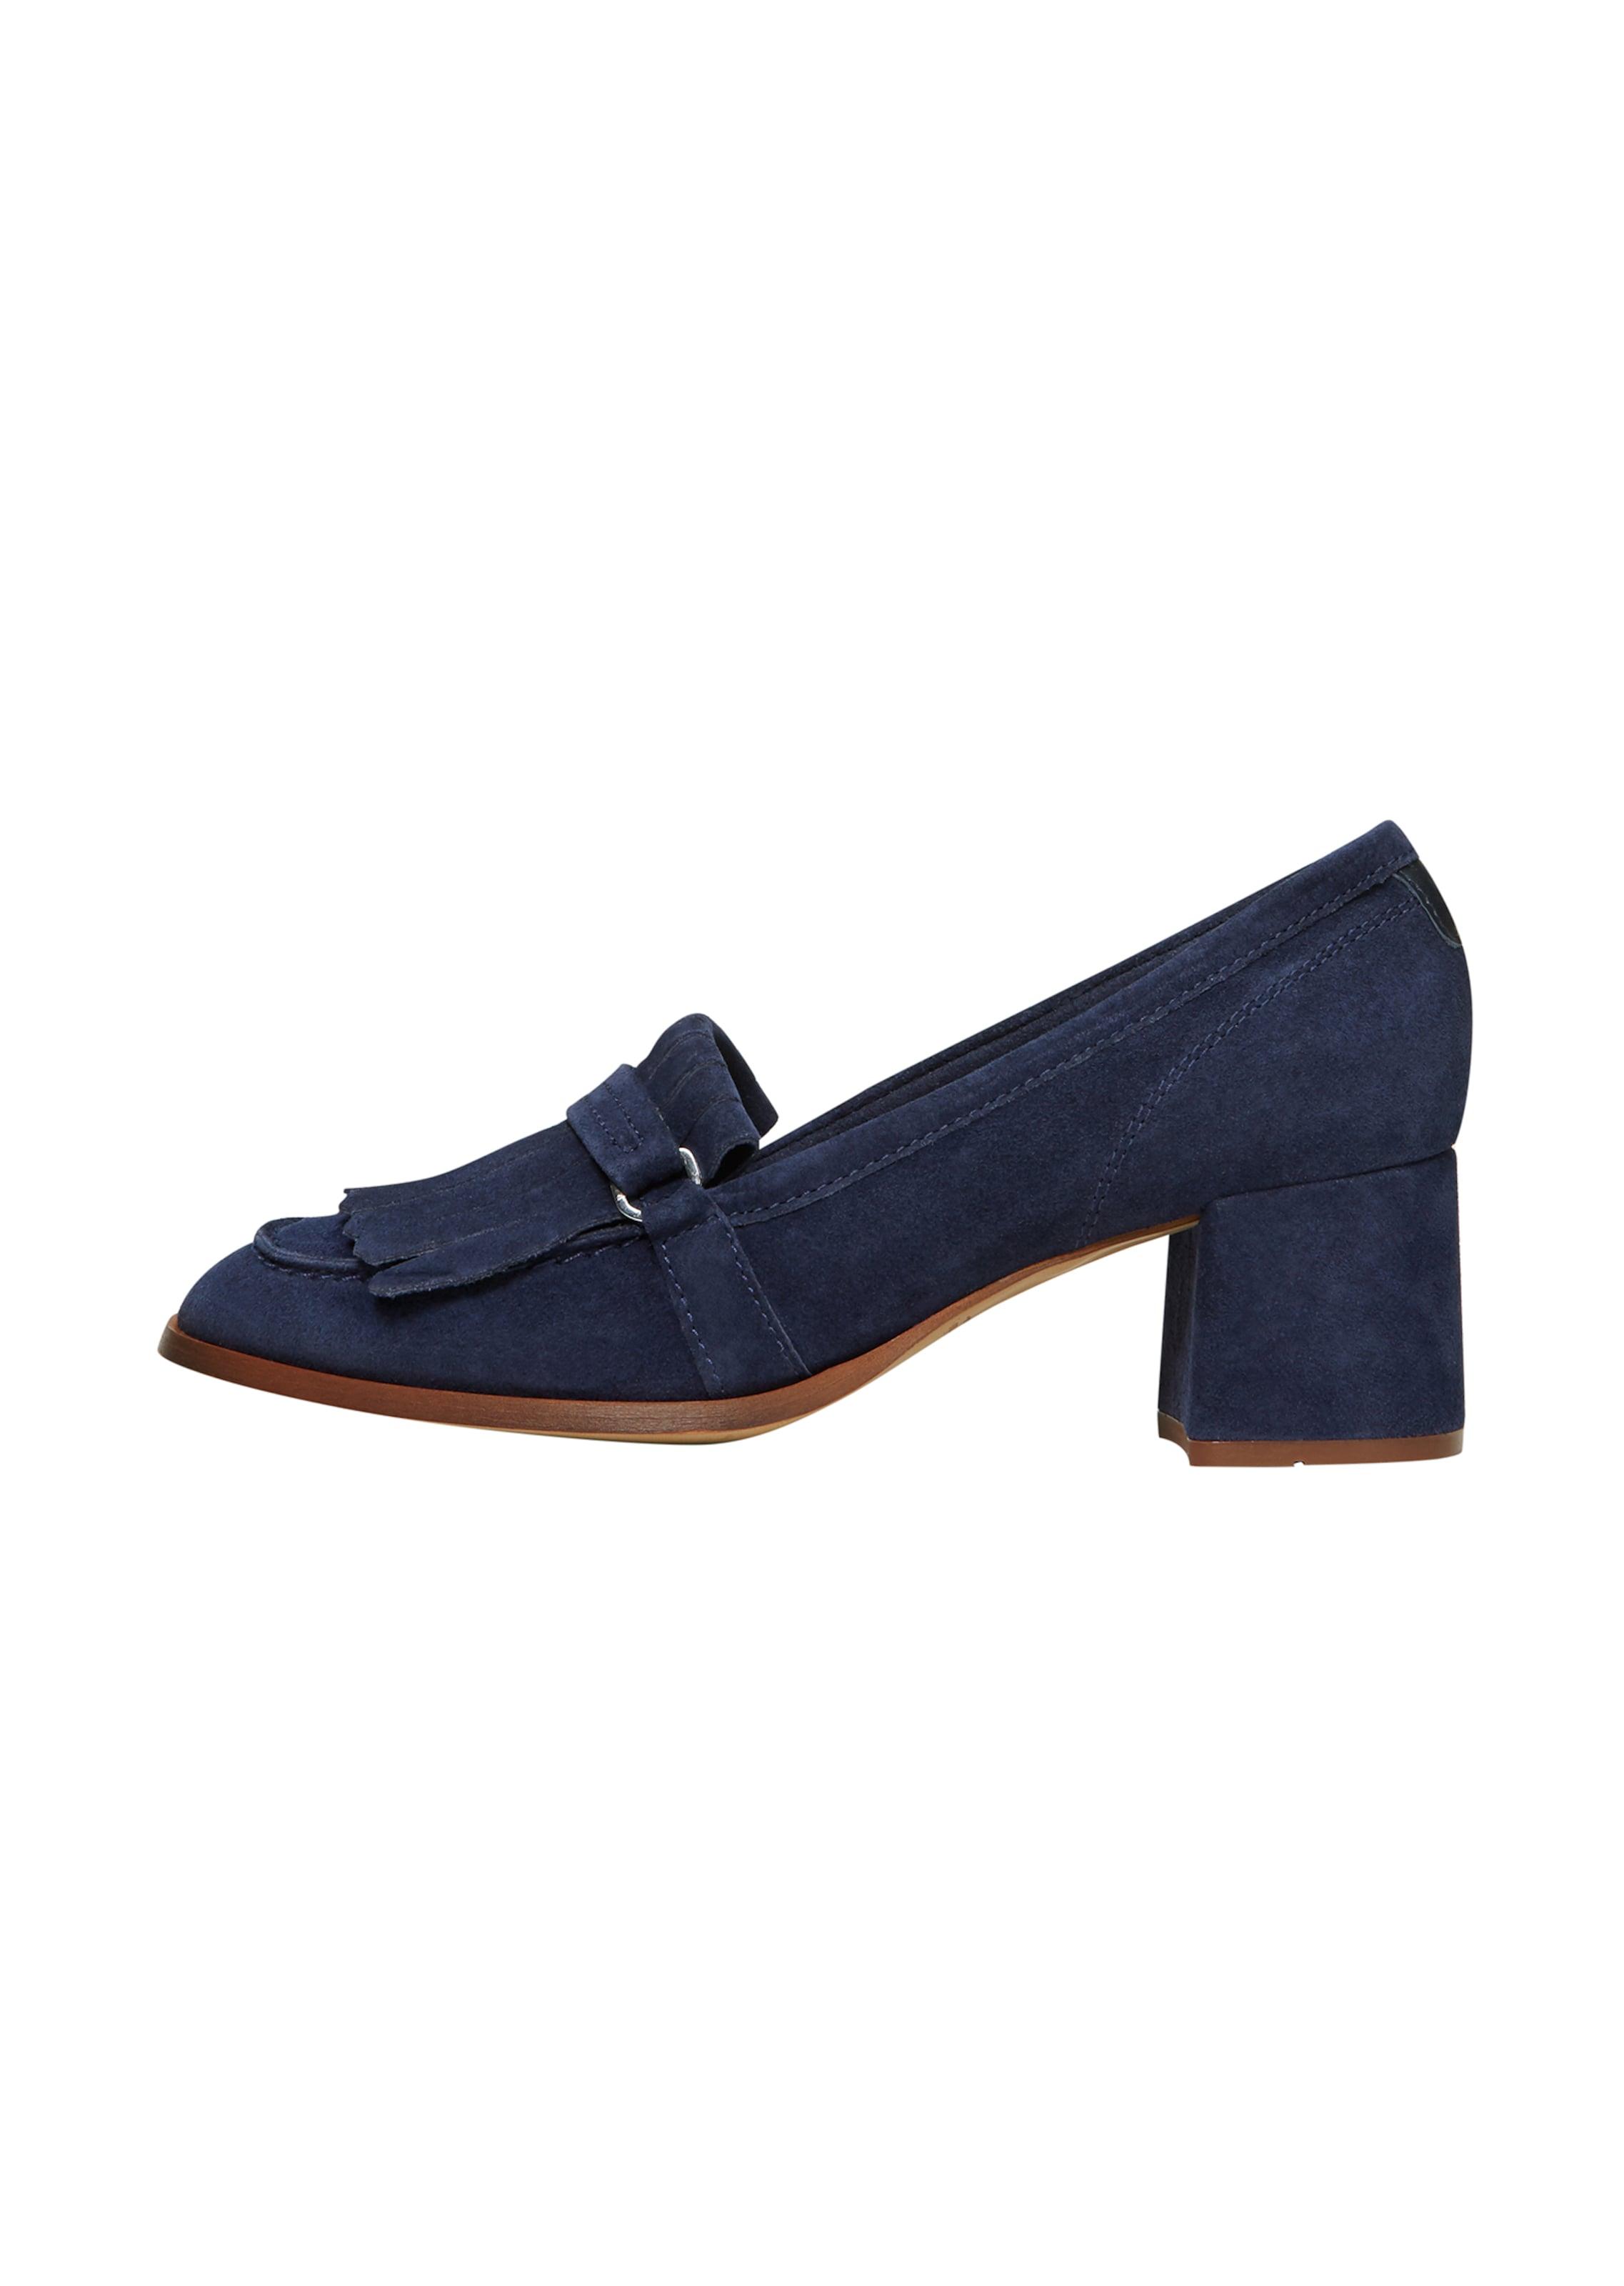 Marc O Polo Pumps Verschleißfeste billige Schuhe